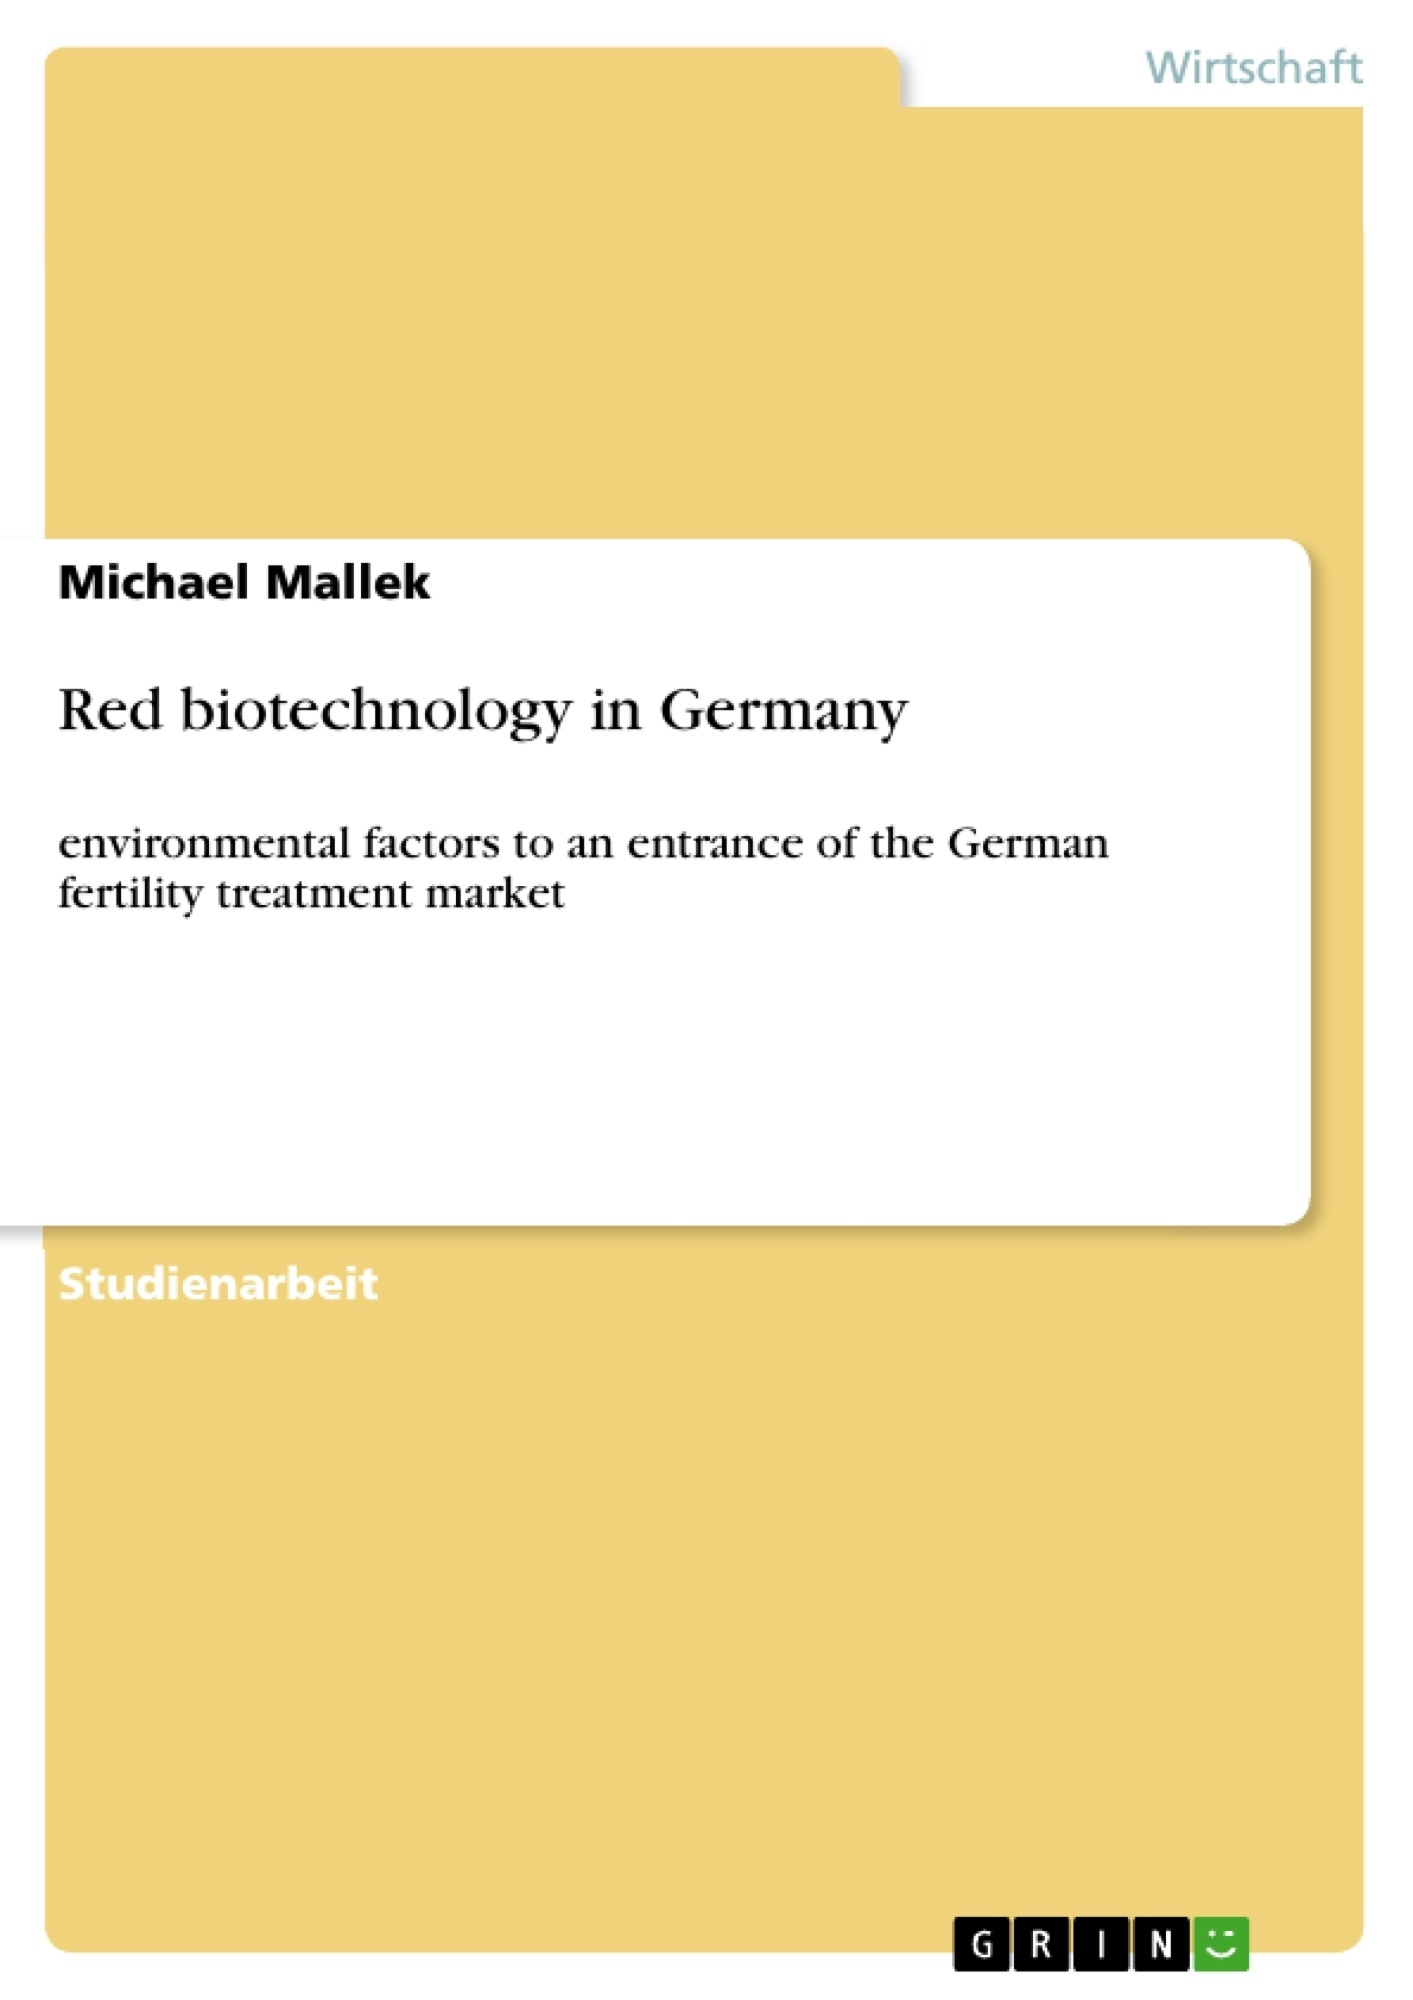 Titel: Red biotechnology in Germany